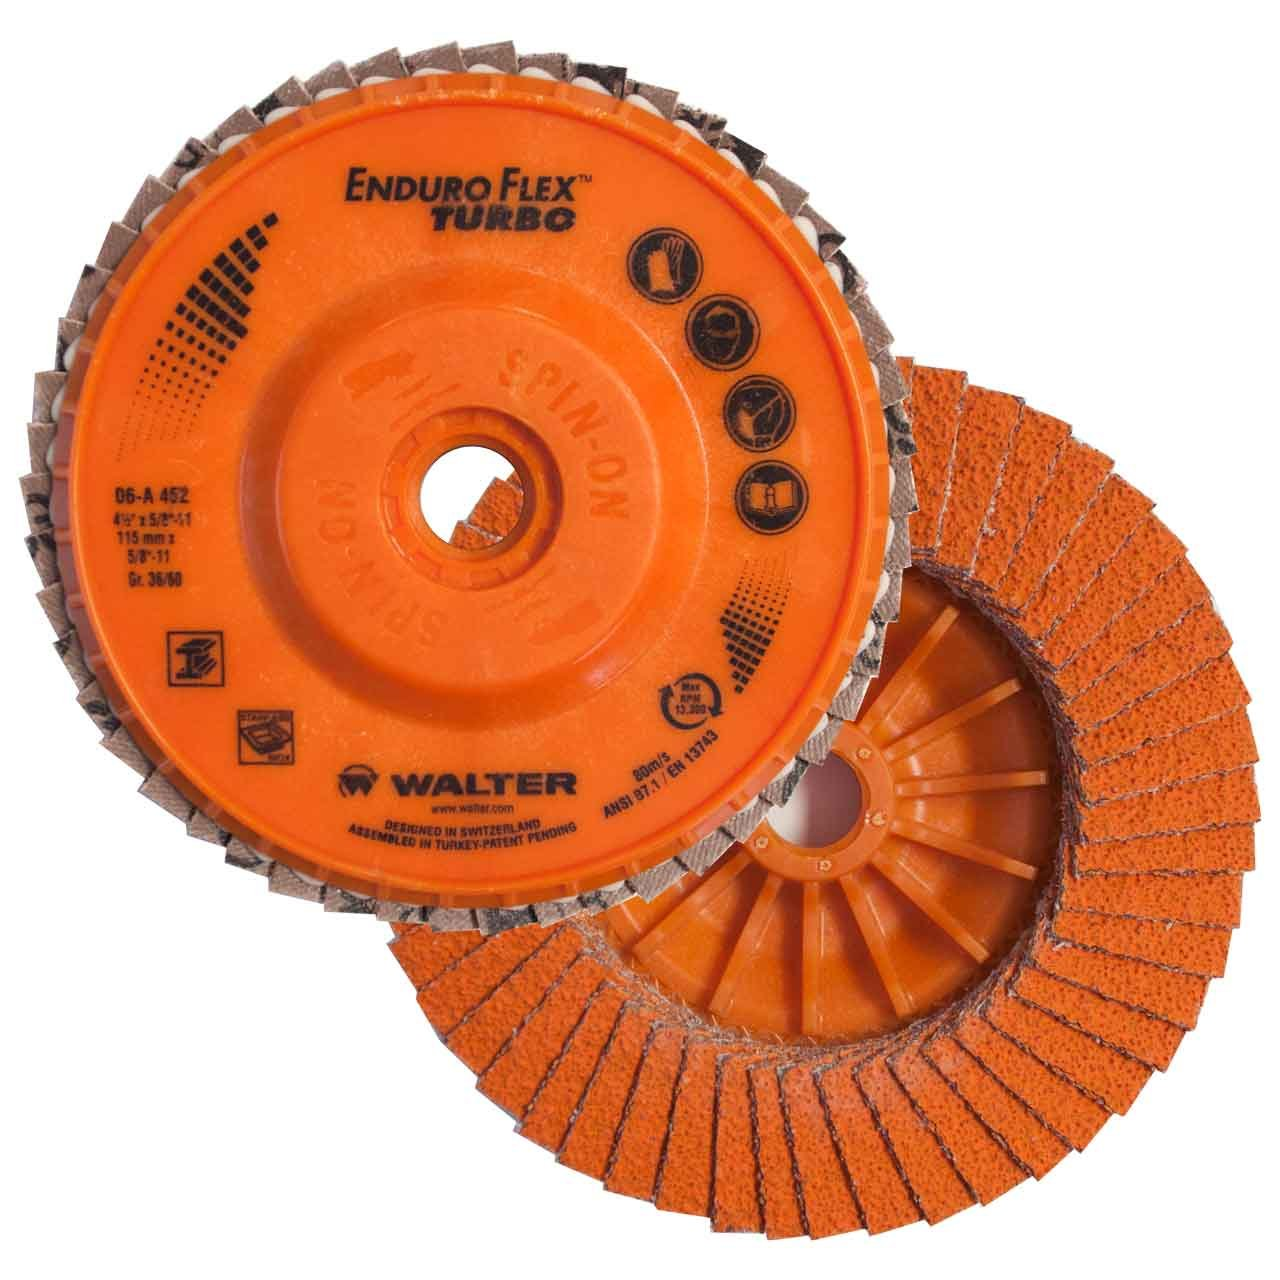 Walter 06A452 4-1/2x5/8-11 Enduro-Flex Turbo Blending Disc, 10 pack